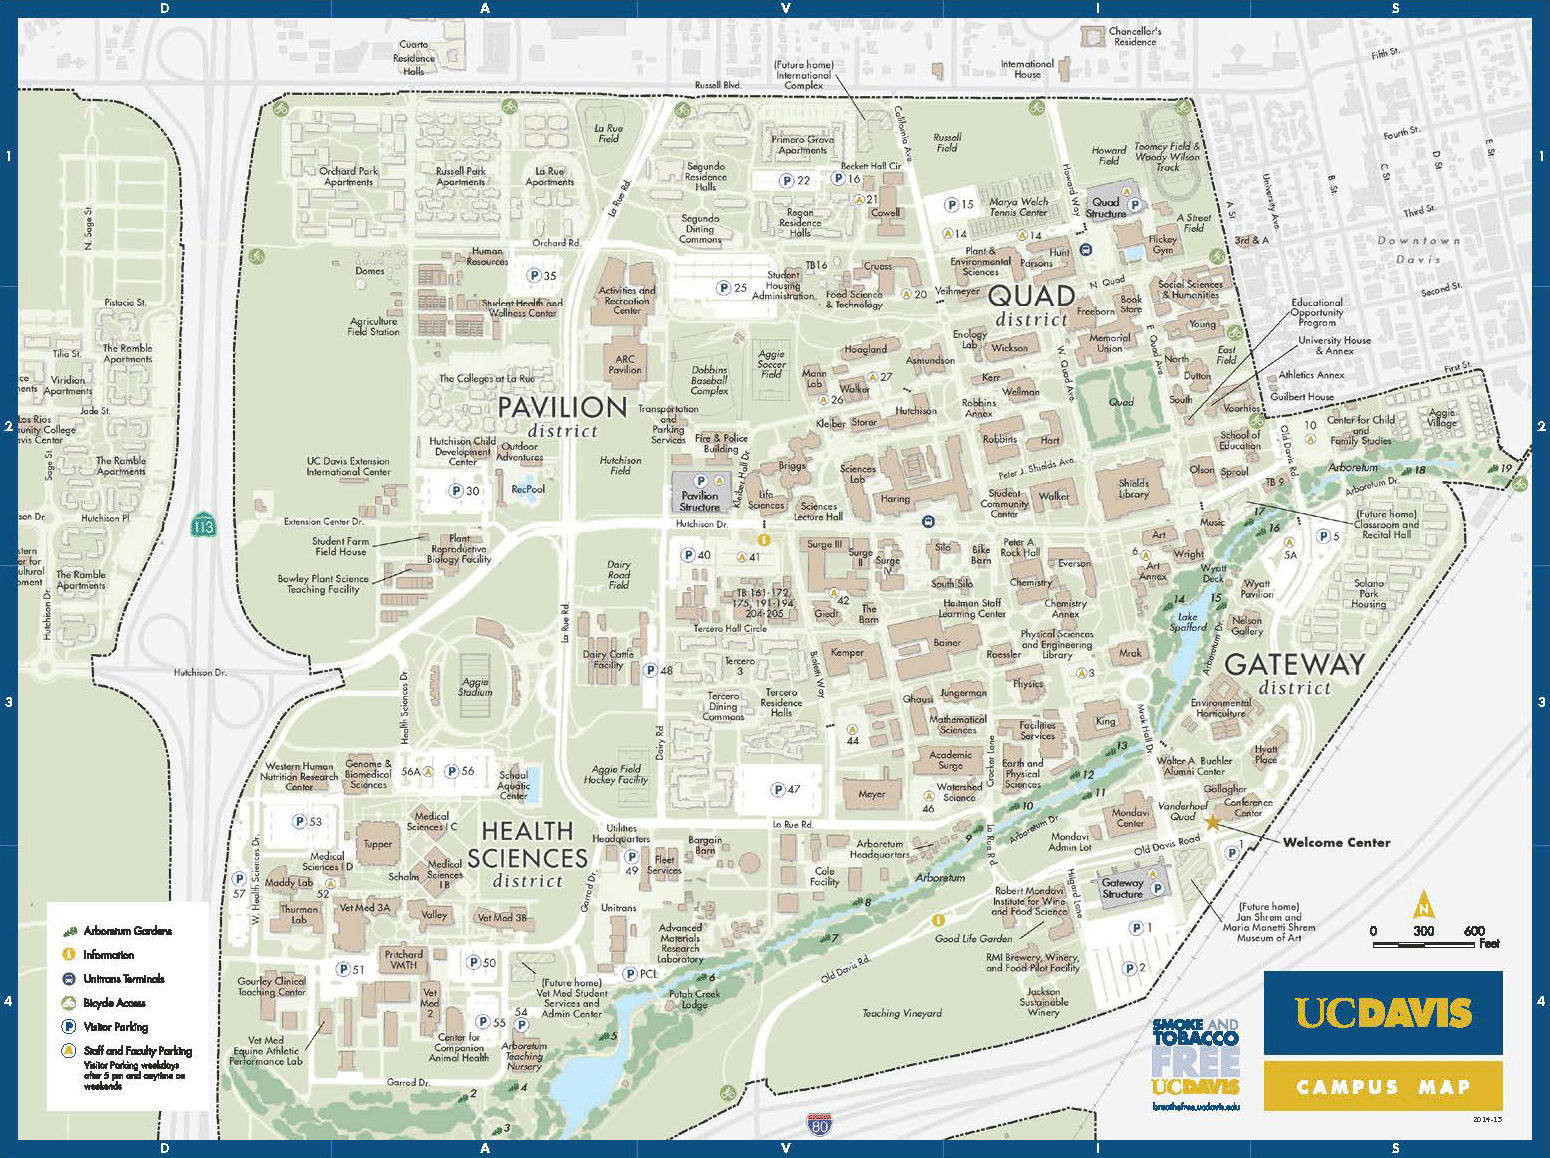 Visitors | Accessibility at UC Davis Uc Davis Campus Map